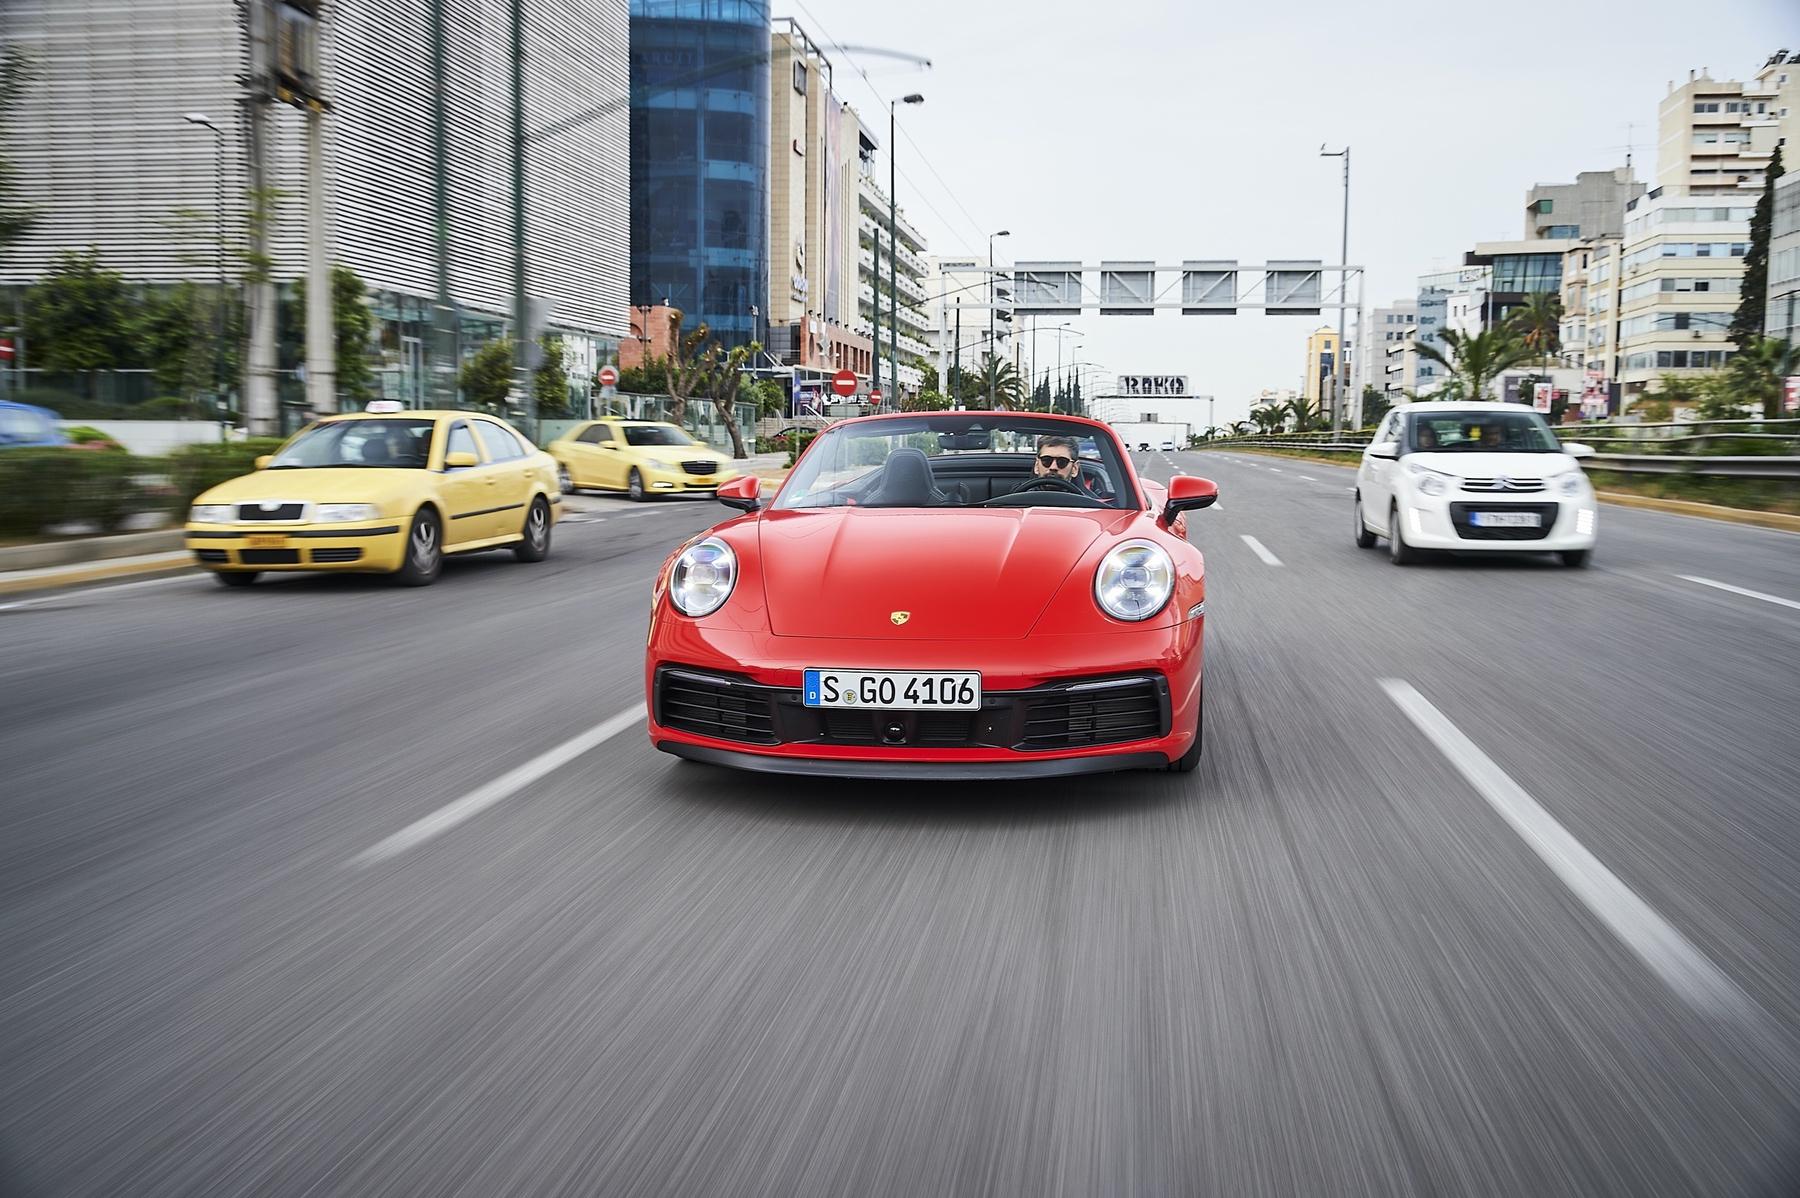 Test_Drive_Porsche_911_Athens_0179